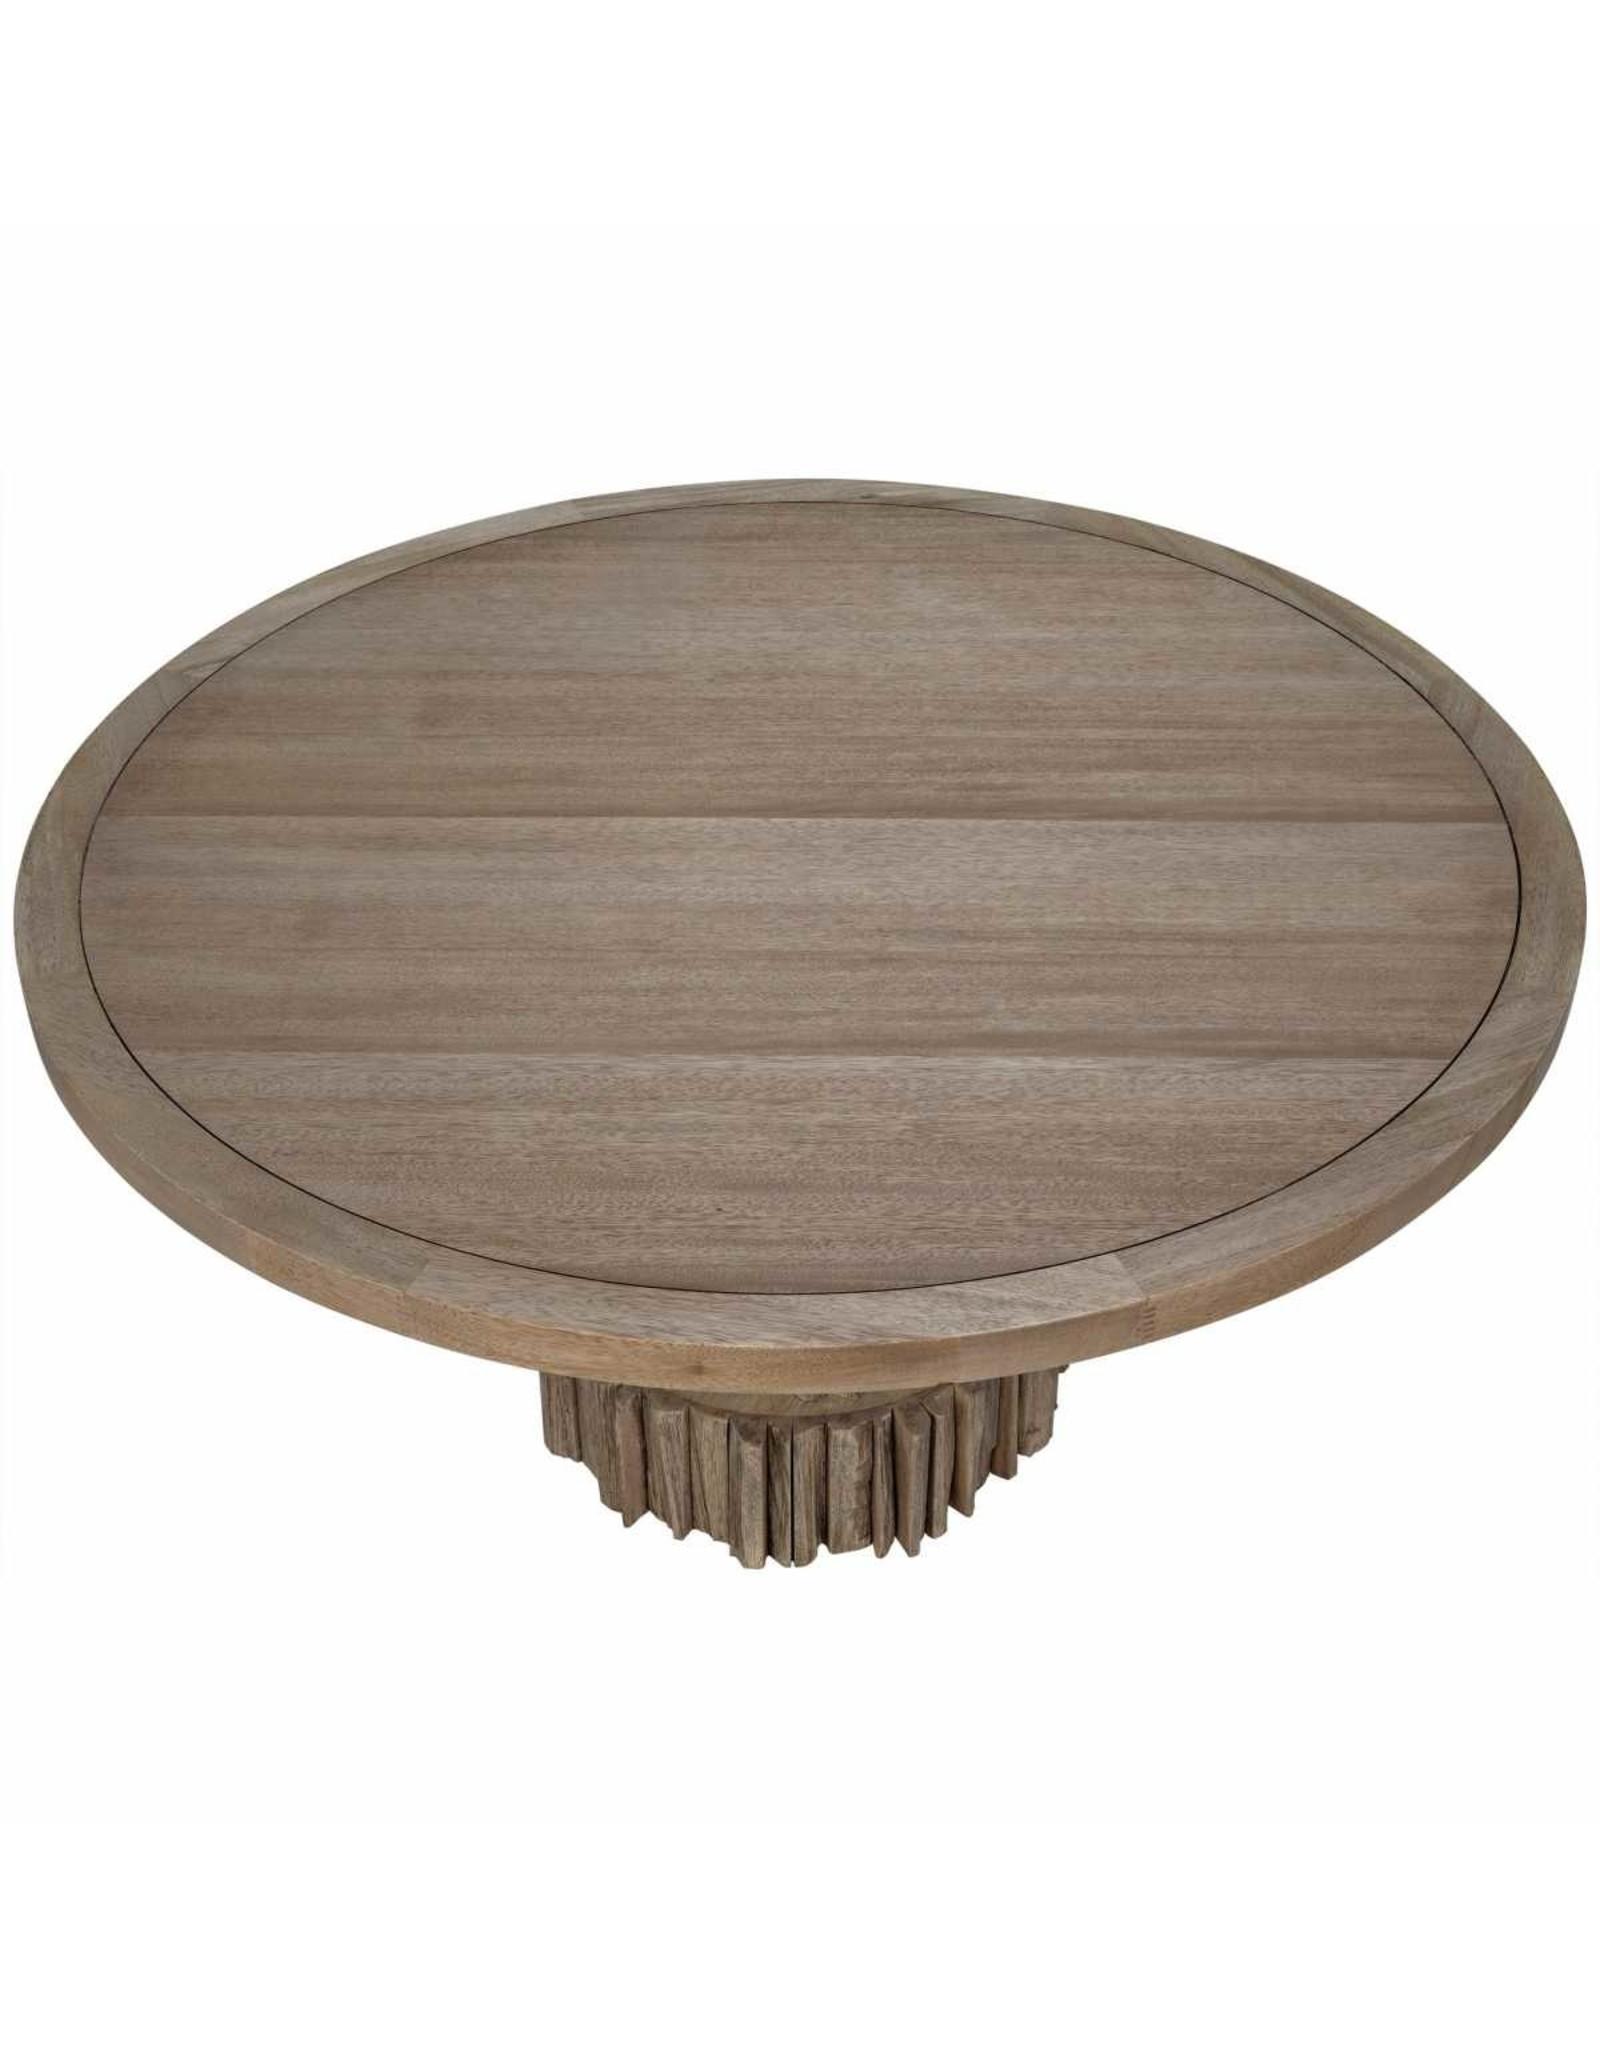 Website Noir Cliff Dining Table